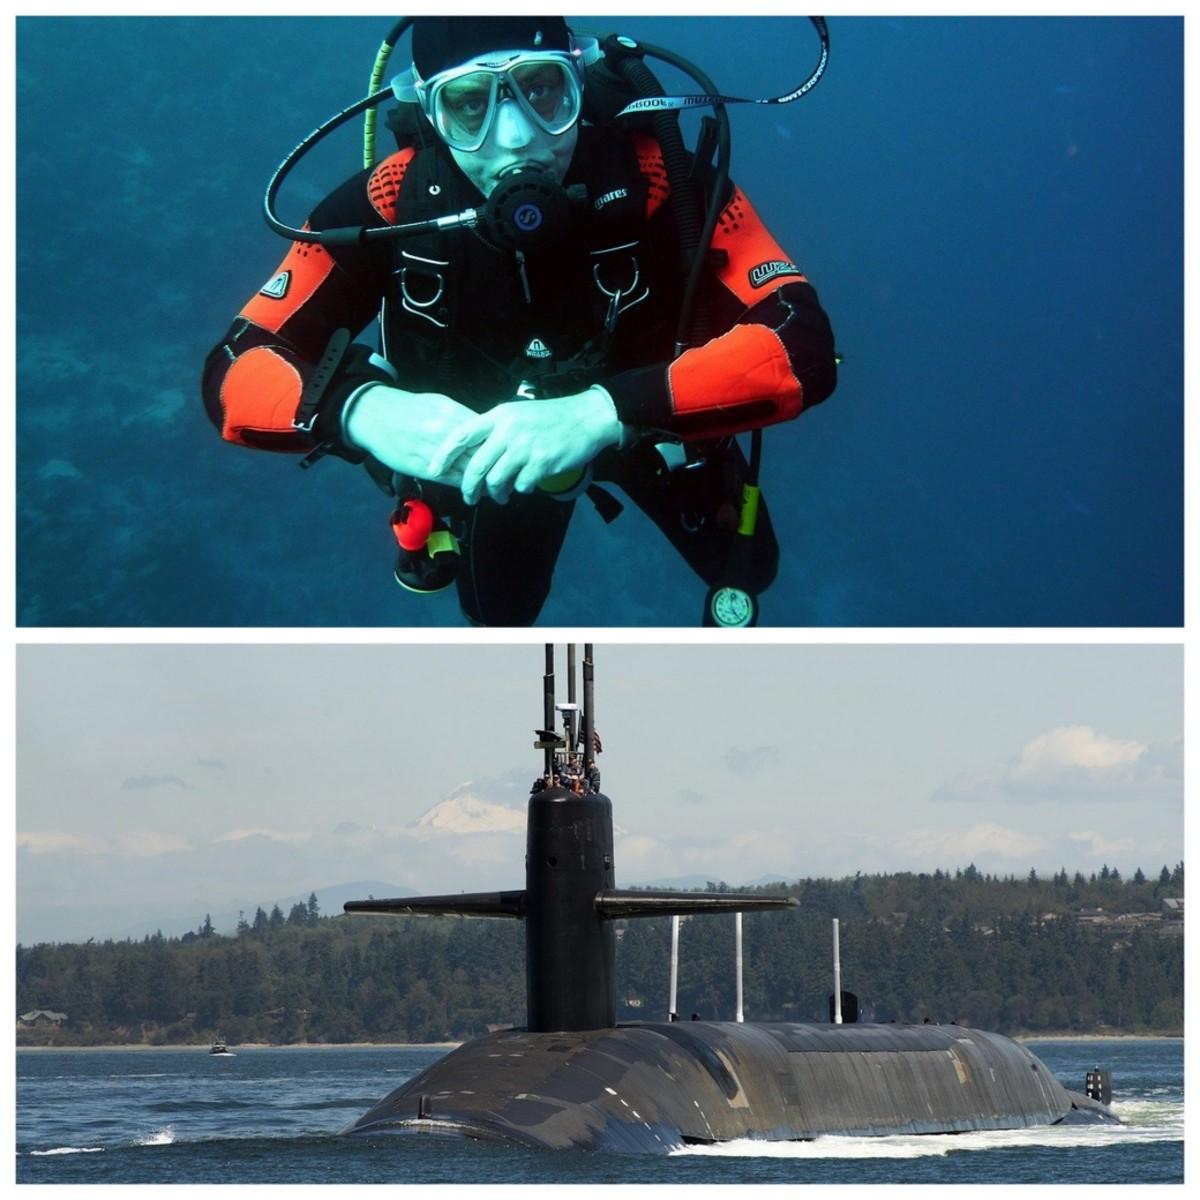 A scuba diver needs to have neutral buoyancy. A submarine needs to have neutral, positive and negative buoyancy.